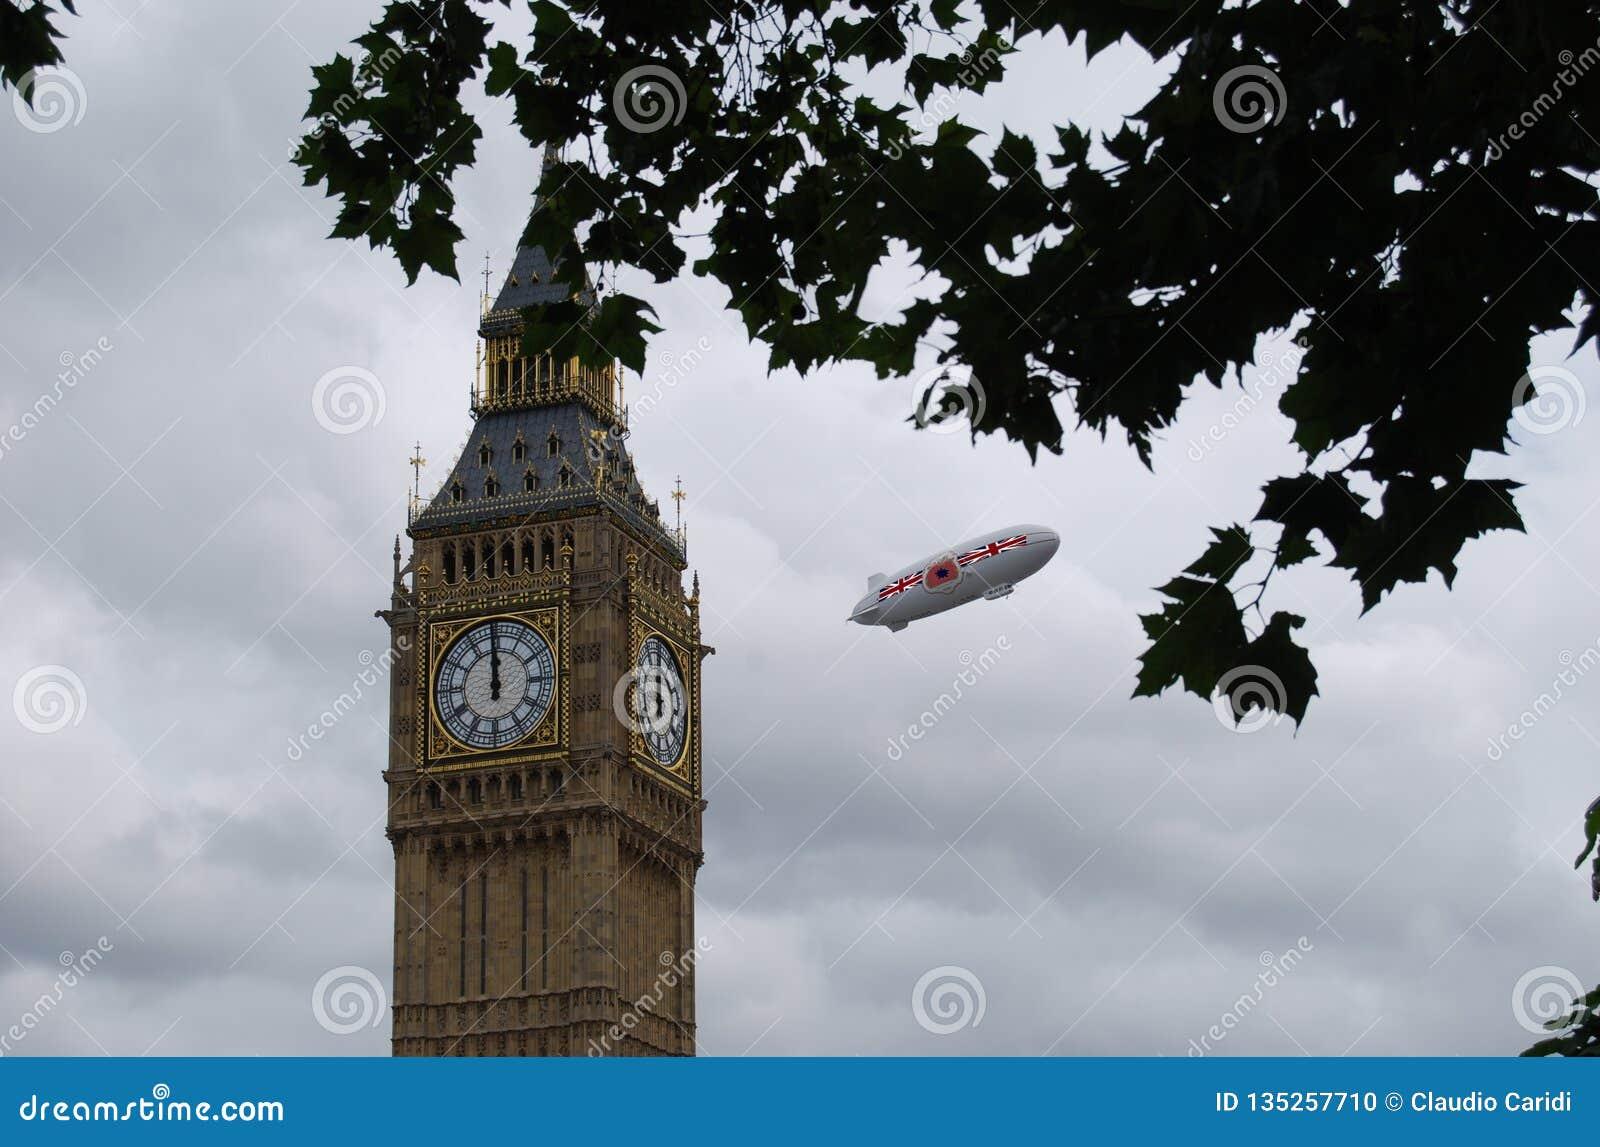 British aerostat over London near the Big Ben